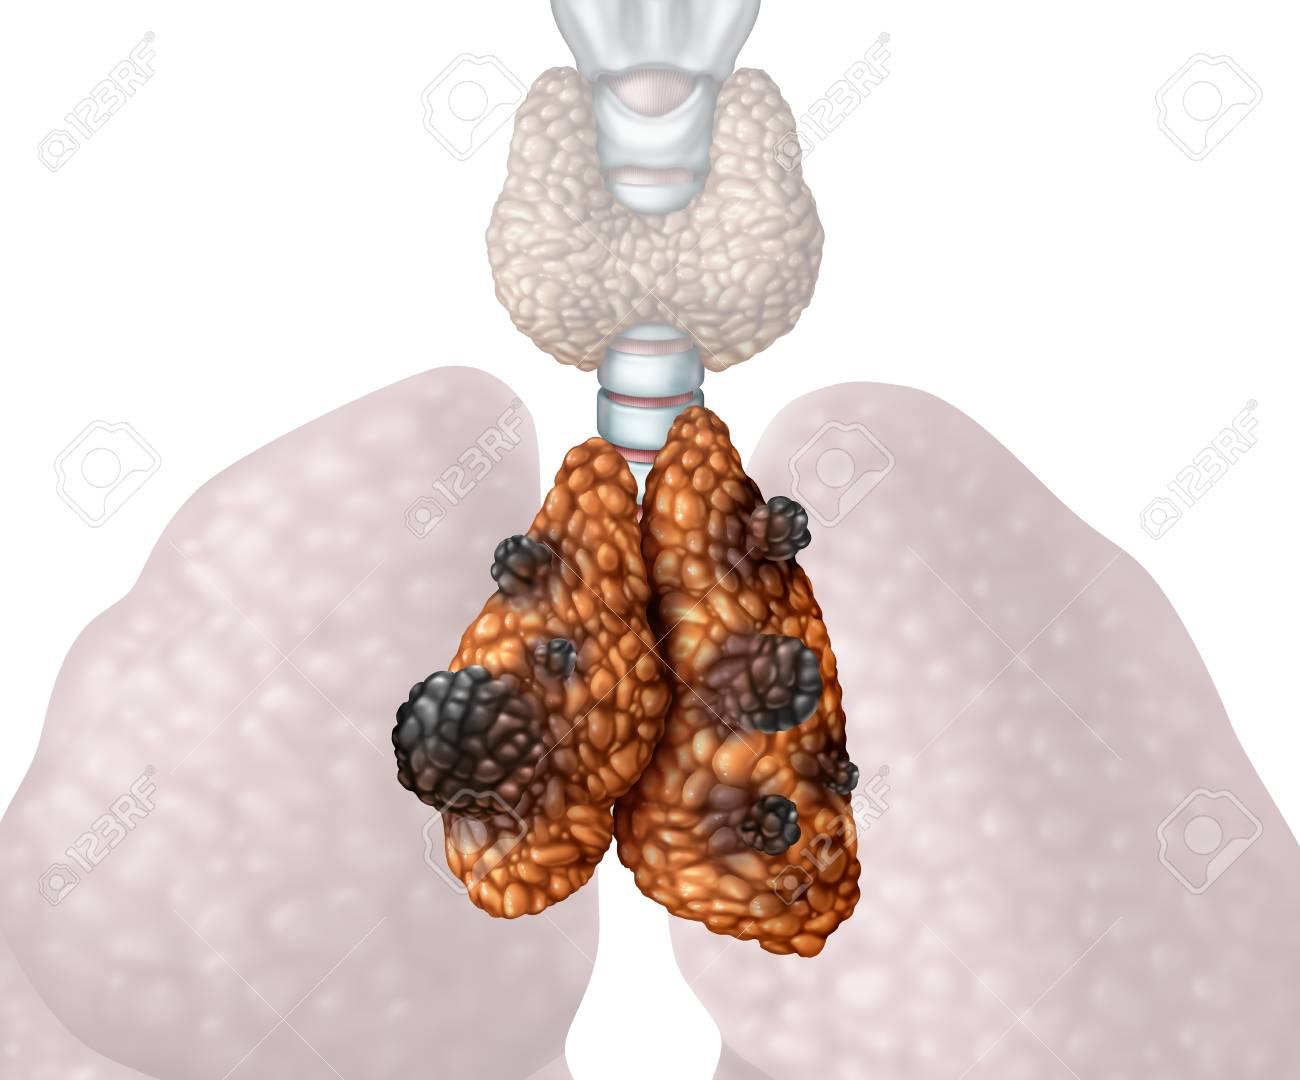 cancer piele malign